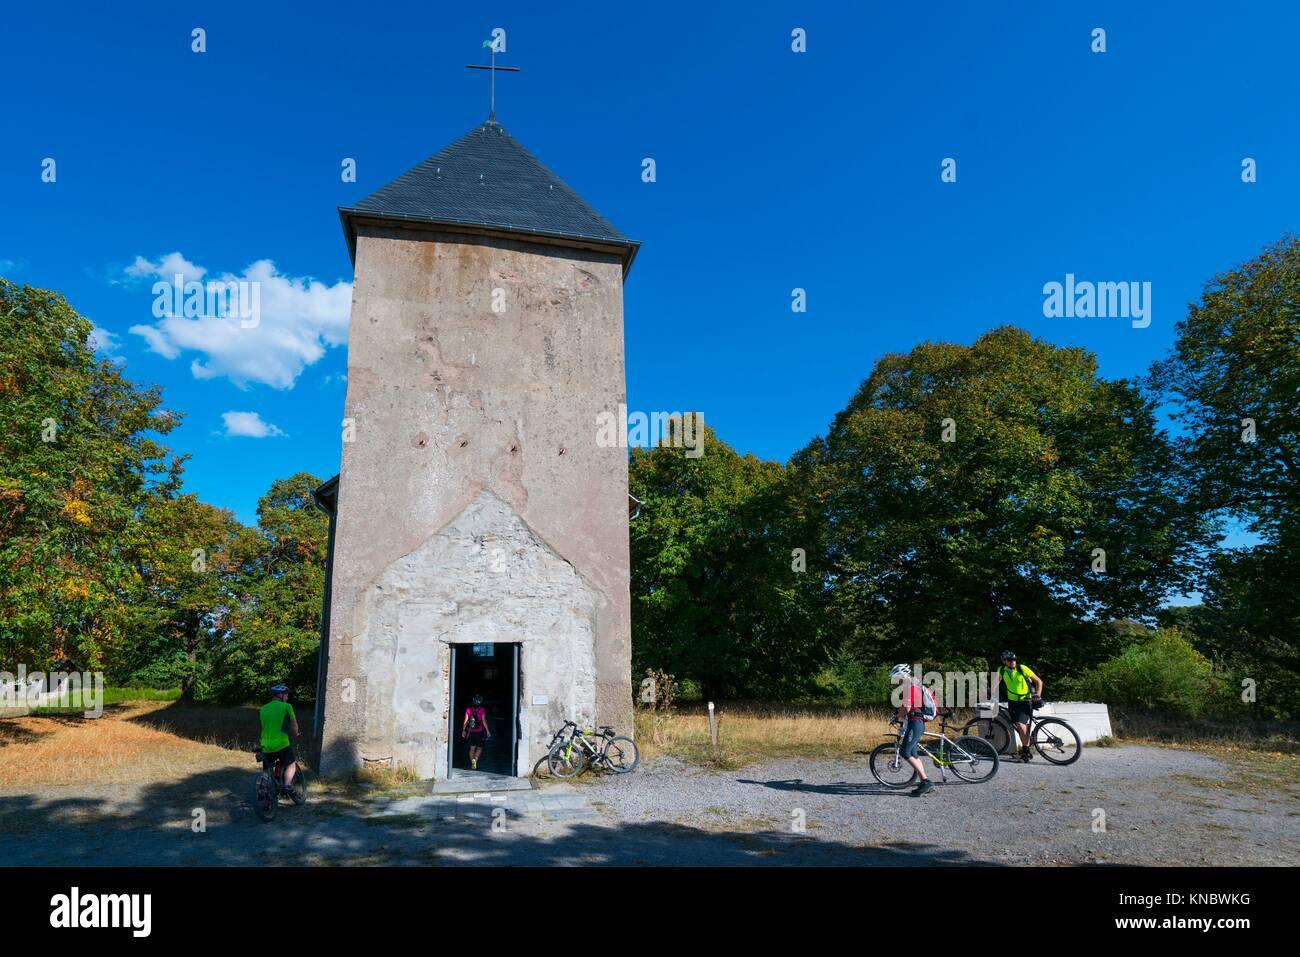 Deserted Village of Wollseifen, Eifel National Park, North Eifel Territory, Eifel Region, Germany, Europe. - Stock Image